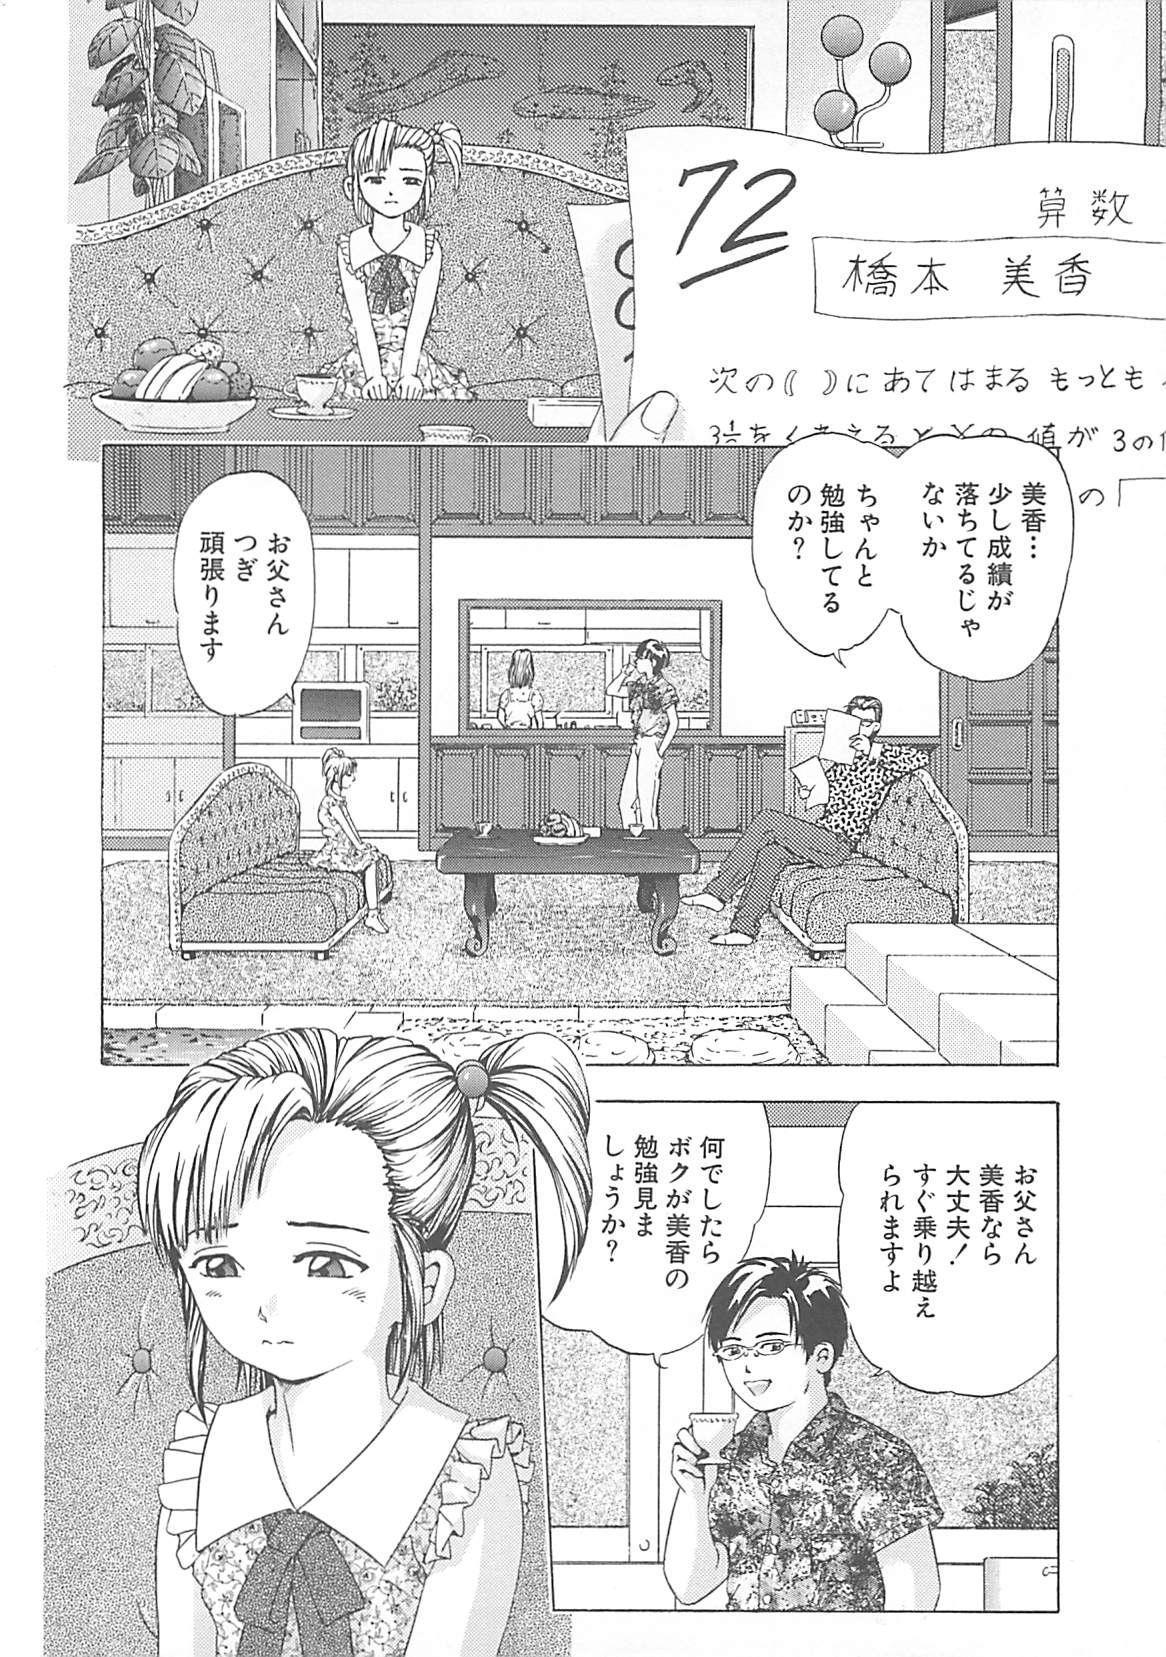 Kanin Kyoushitsu - Adultery Classroom 52